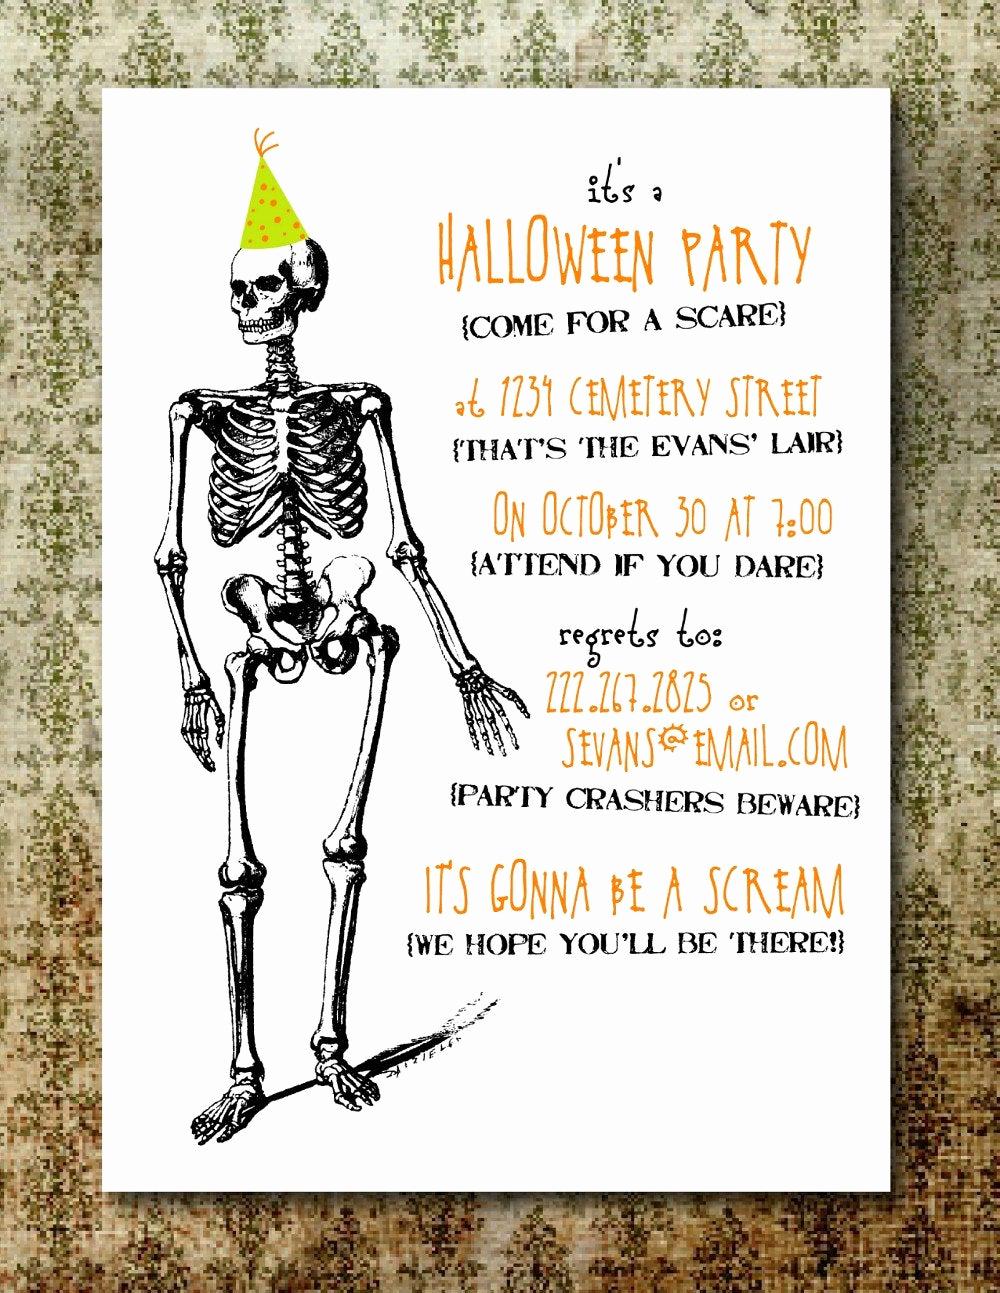 Halloween Party Invitations Templates Inspirational Printable Spooky Halloween Party Invitation